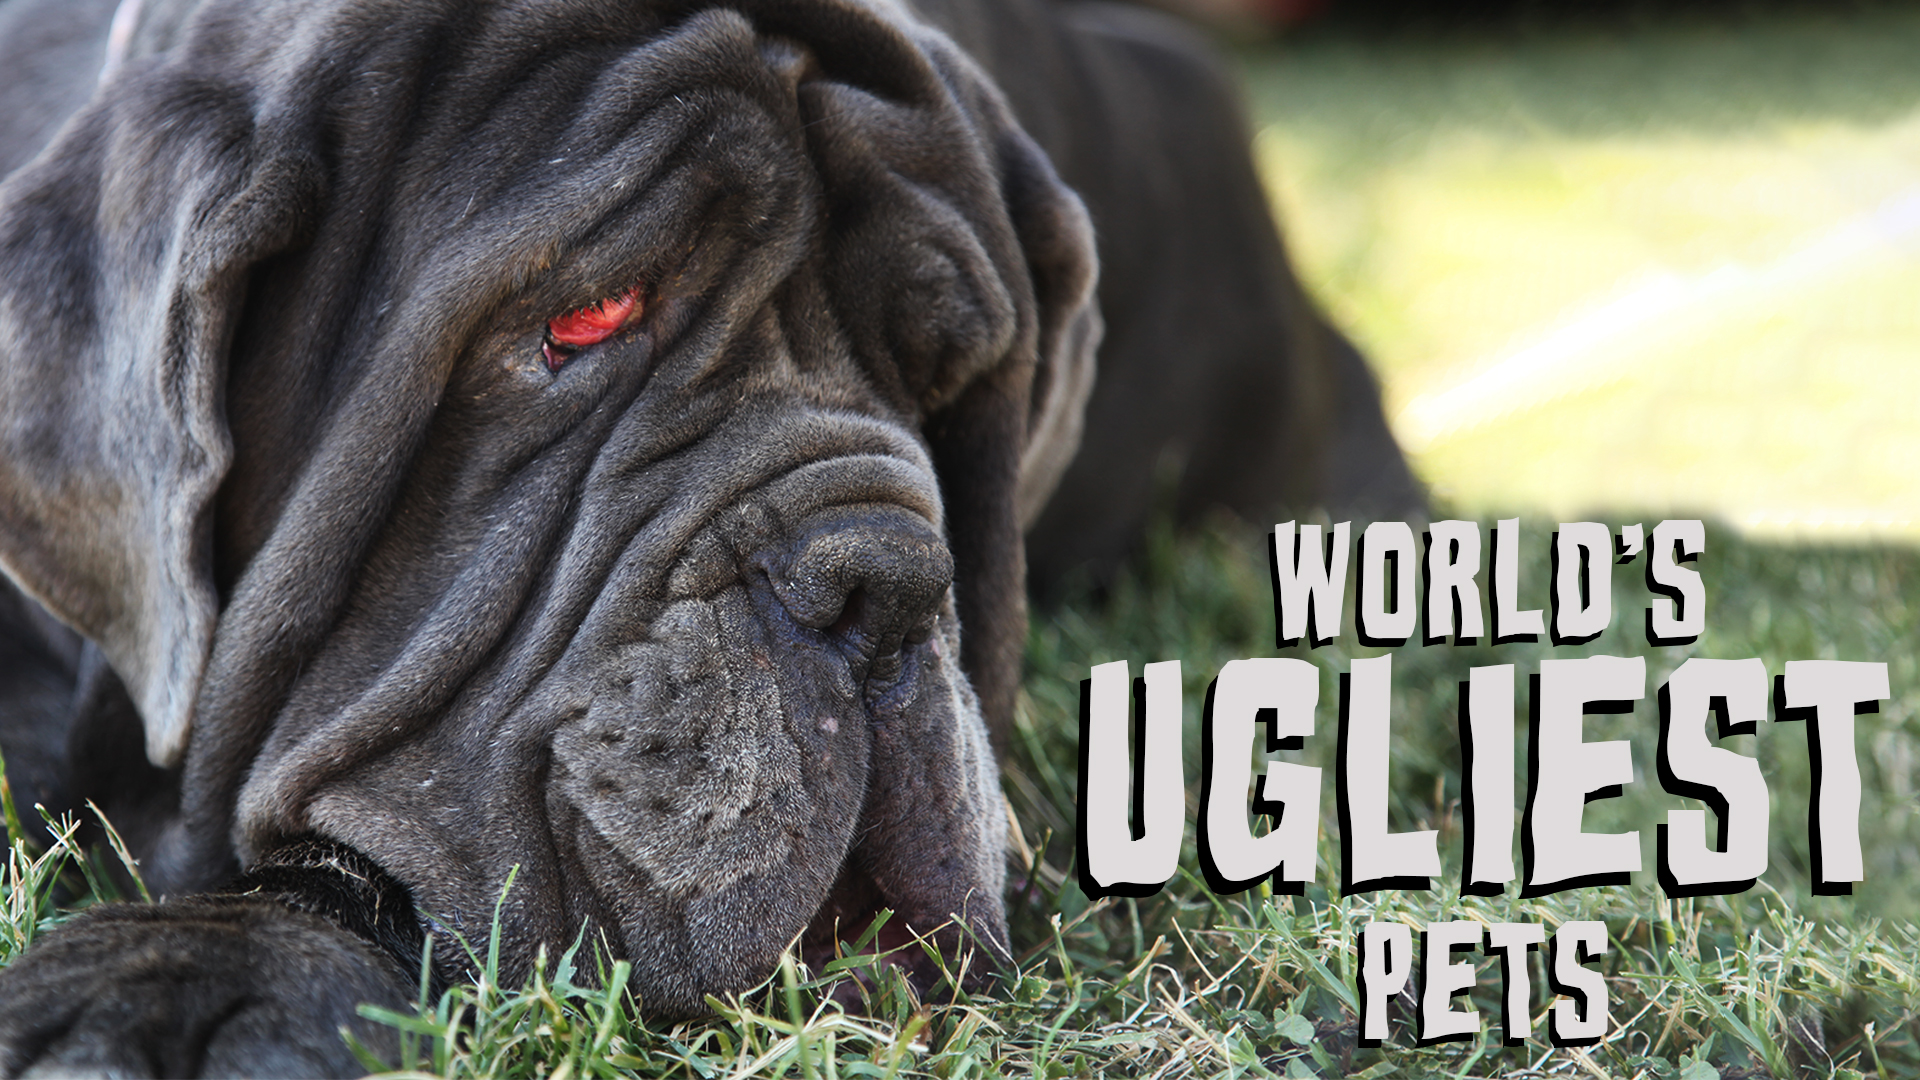 World's Ugliest Pets